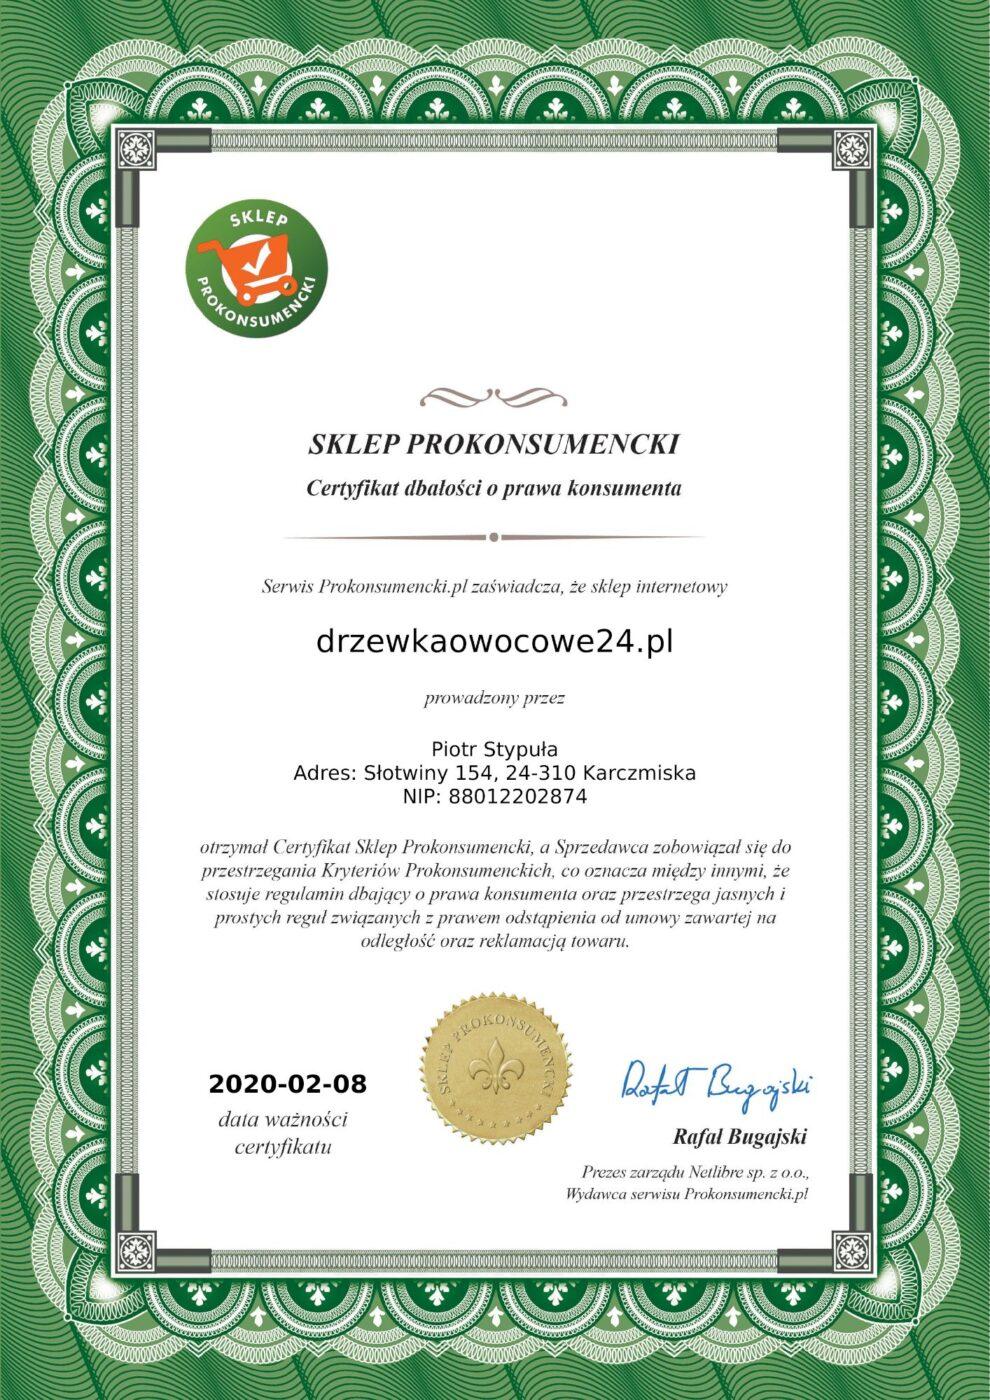 Certyfikat sklepu prokonsumenckiego